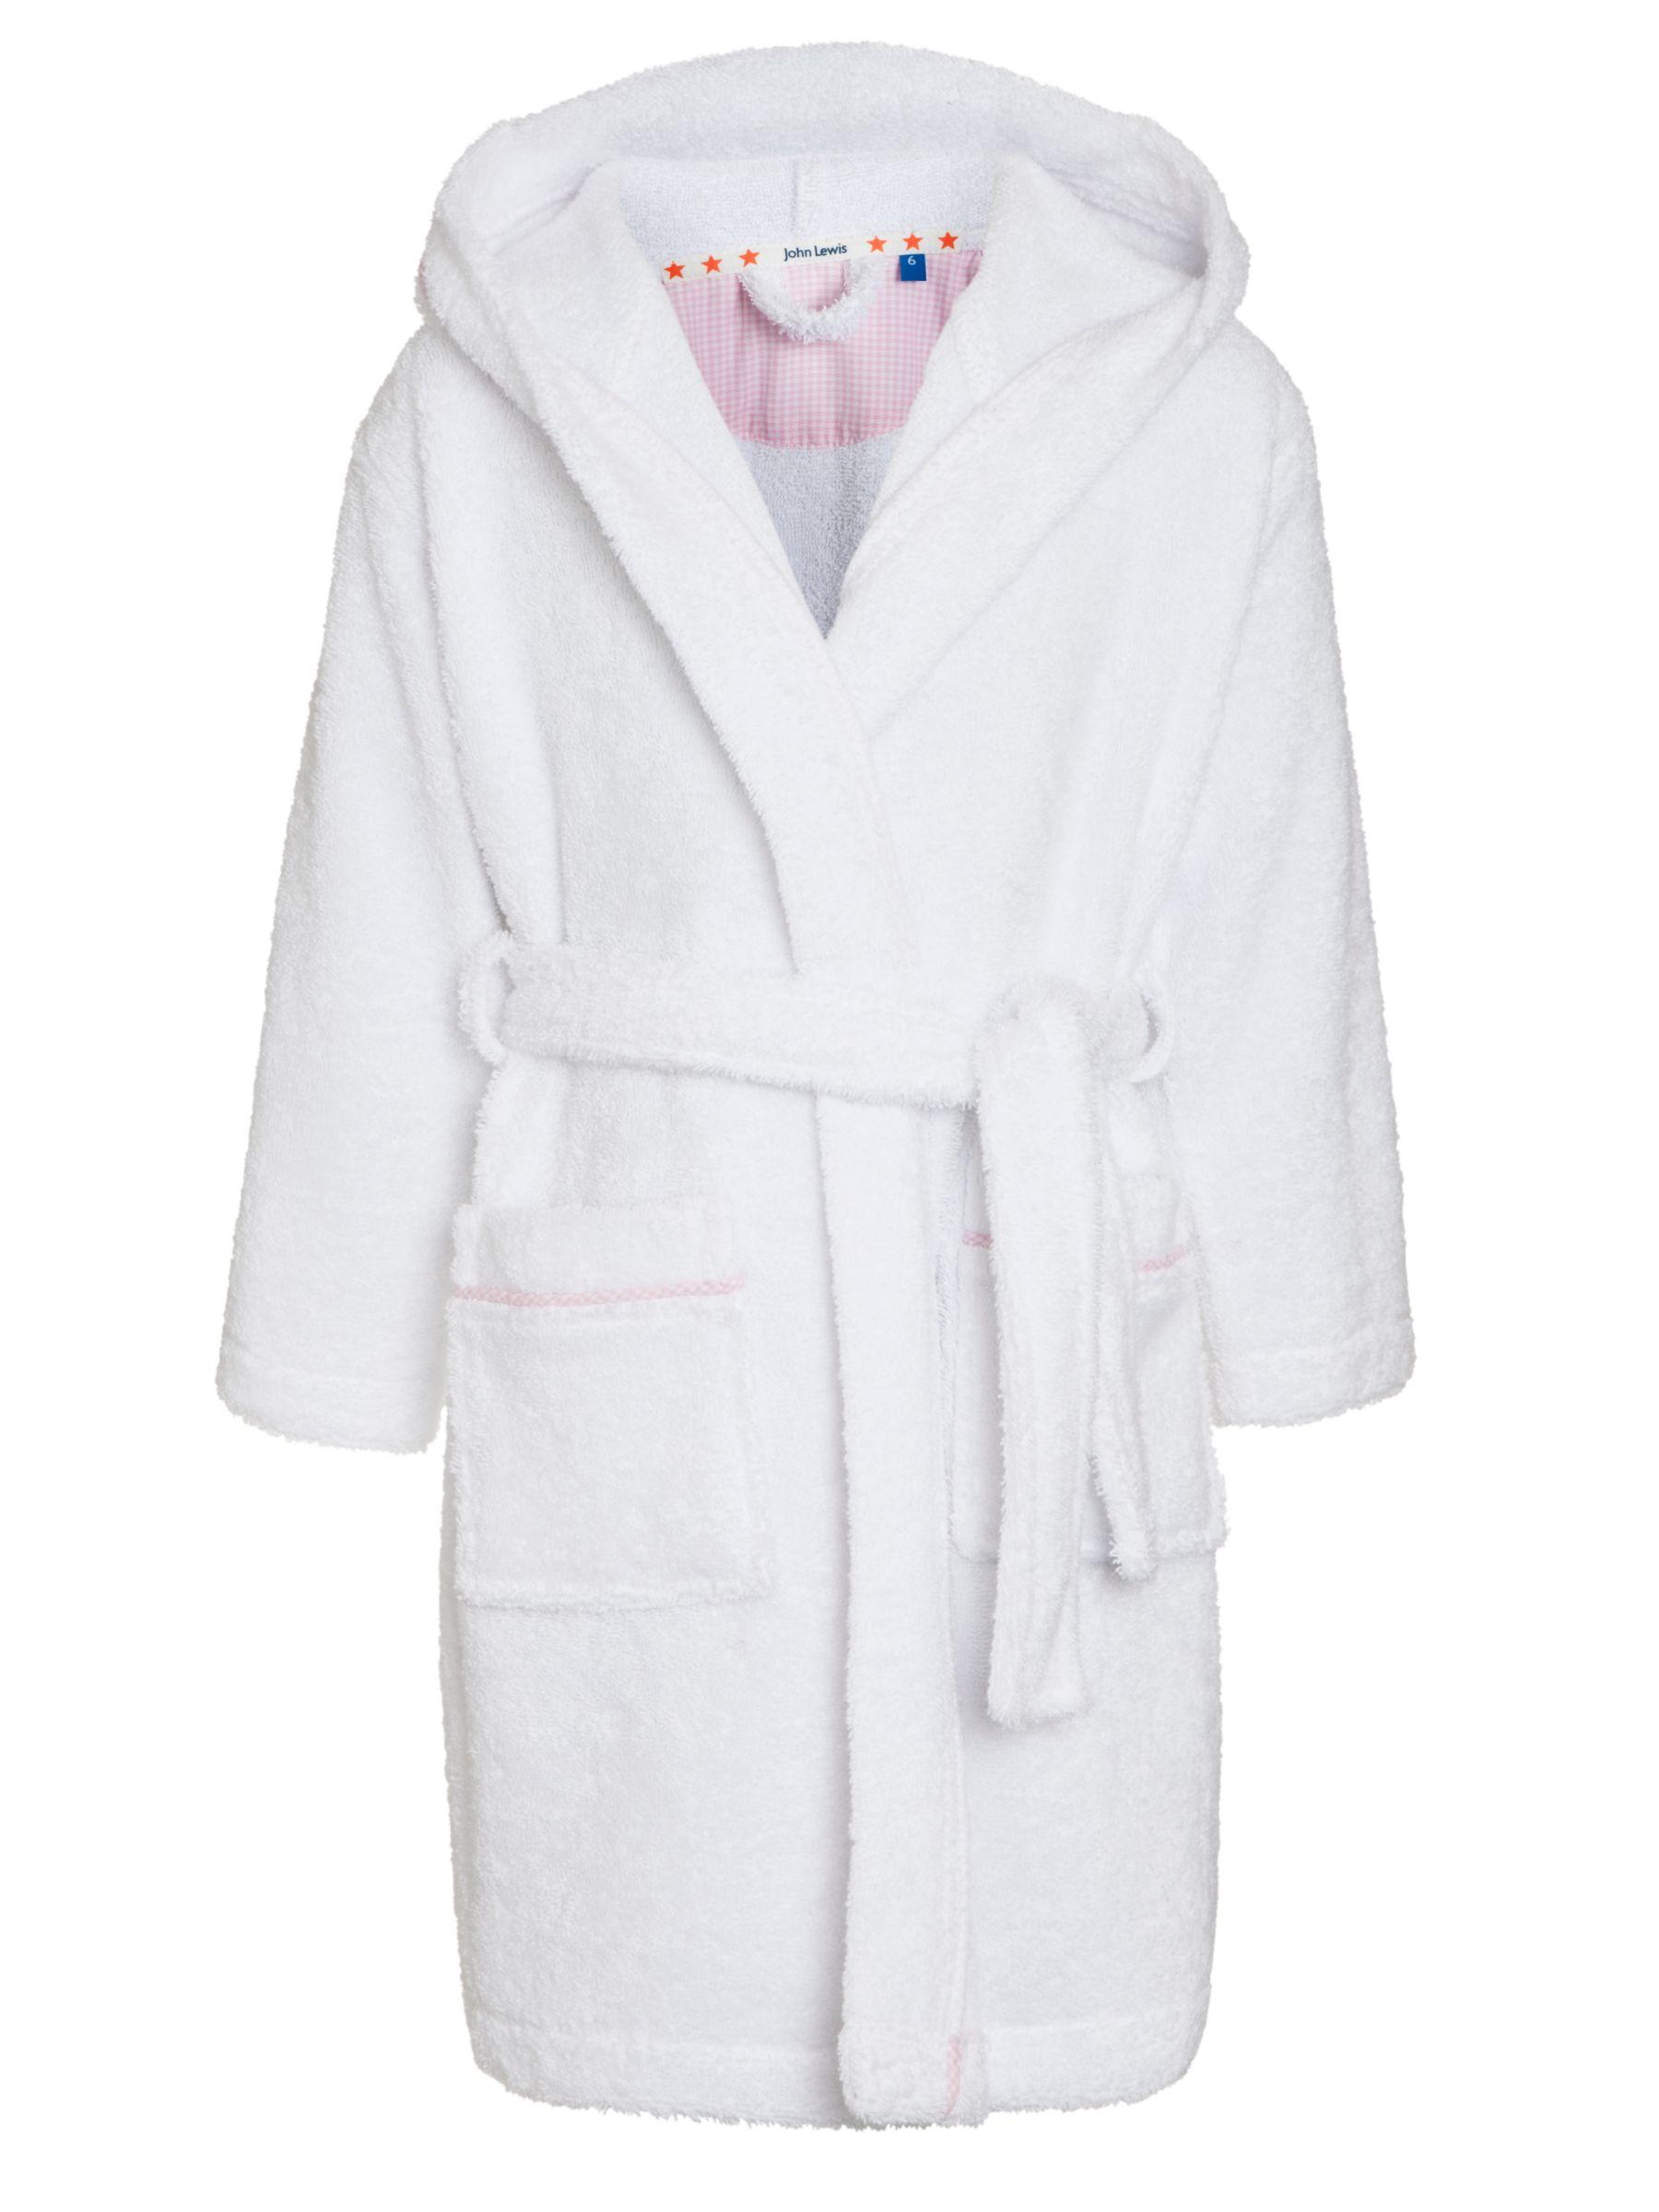 John Lewis Girl Towelling Robe, White